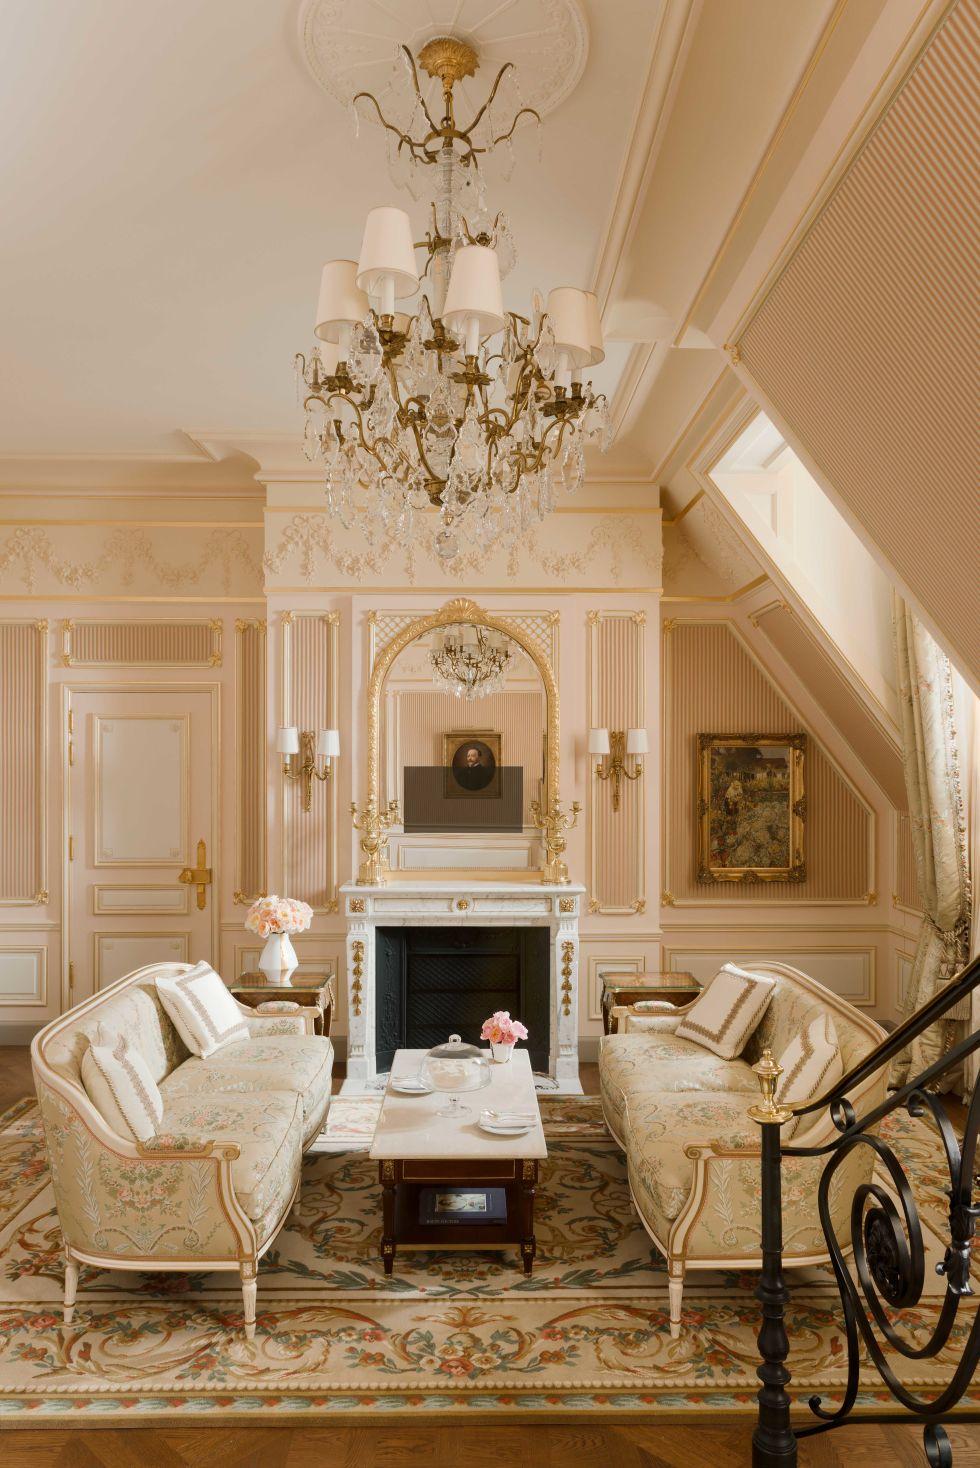 The Ritz Paris Has Finally Reopened  Ritz Paris Renovations Complete